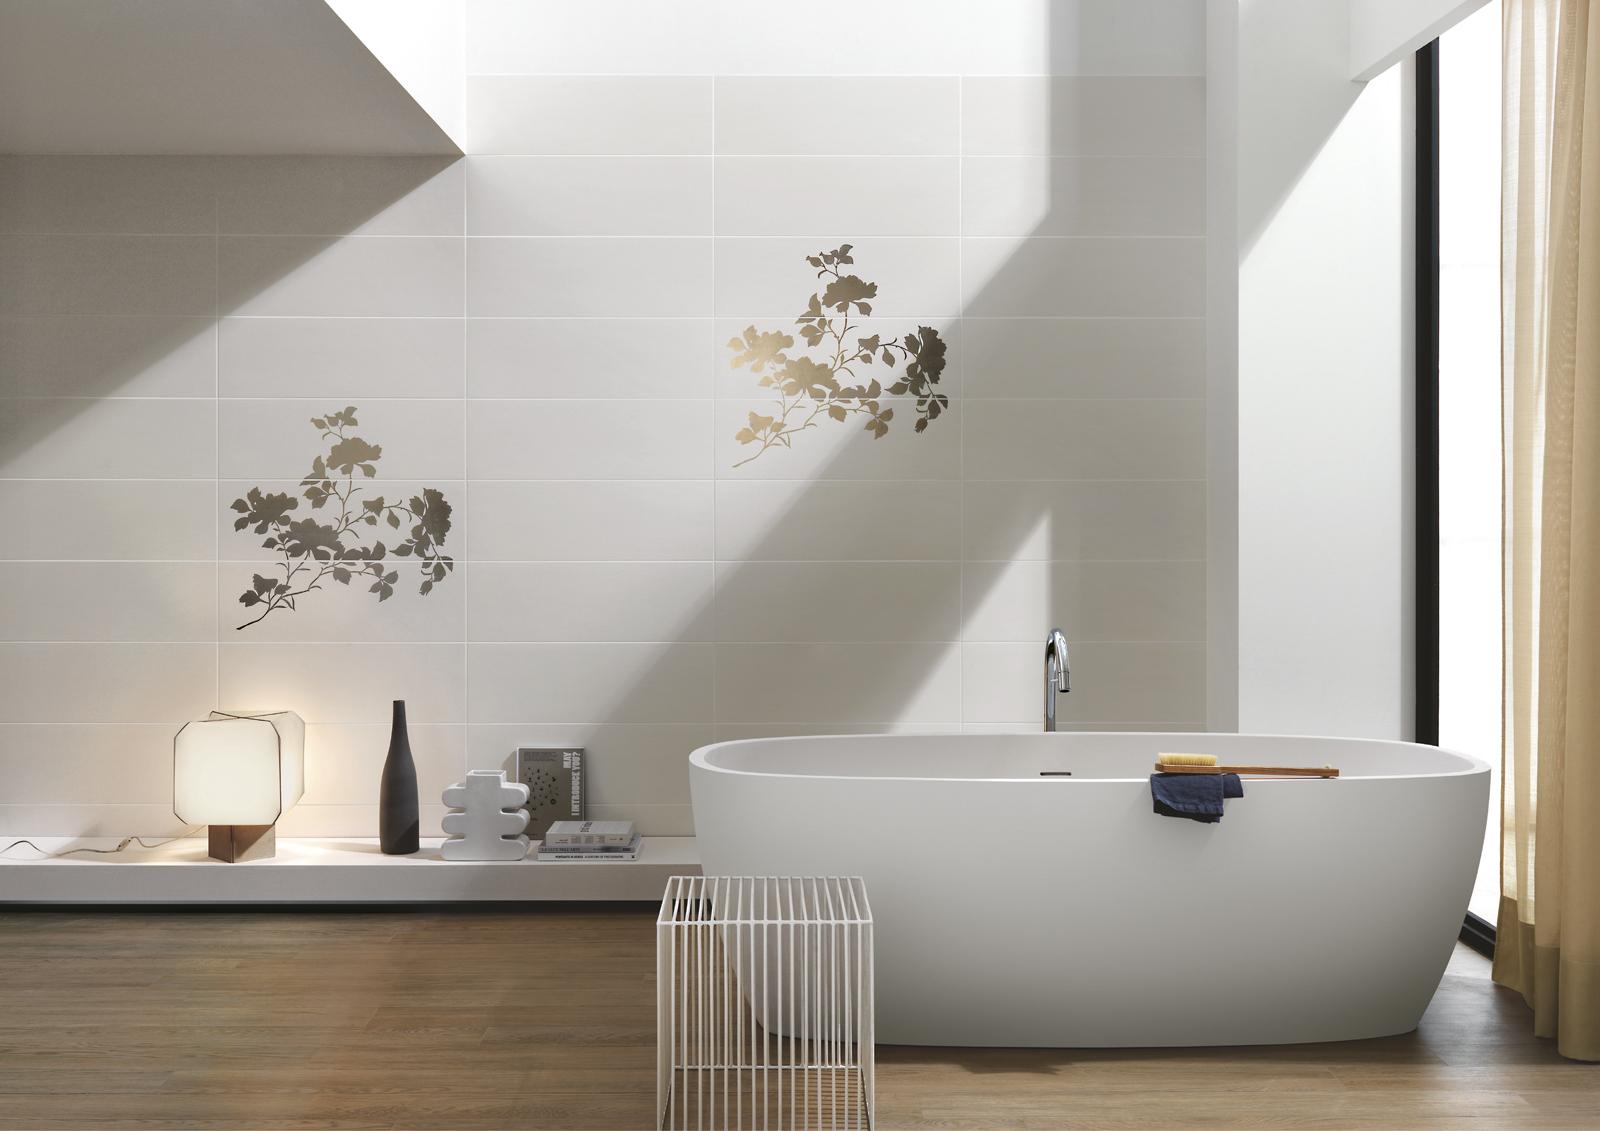 Rivestimento bagno grigio ragno rivestimento bagno moderno frame